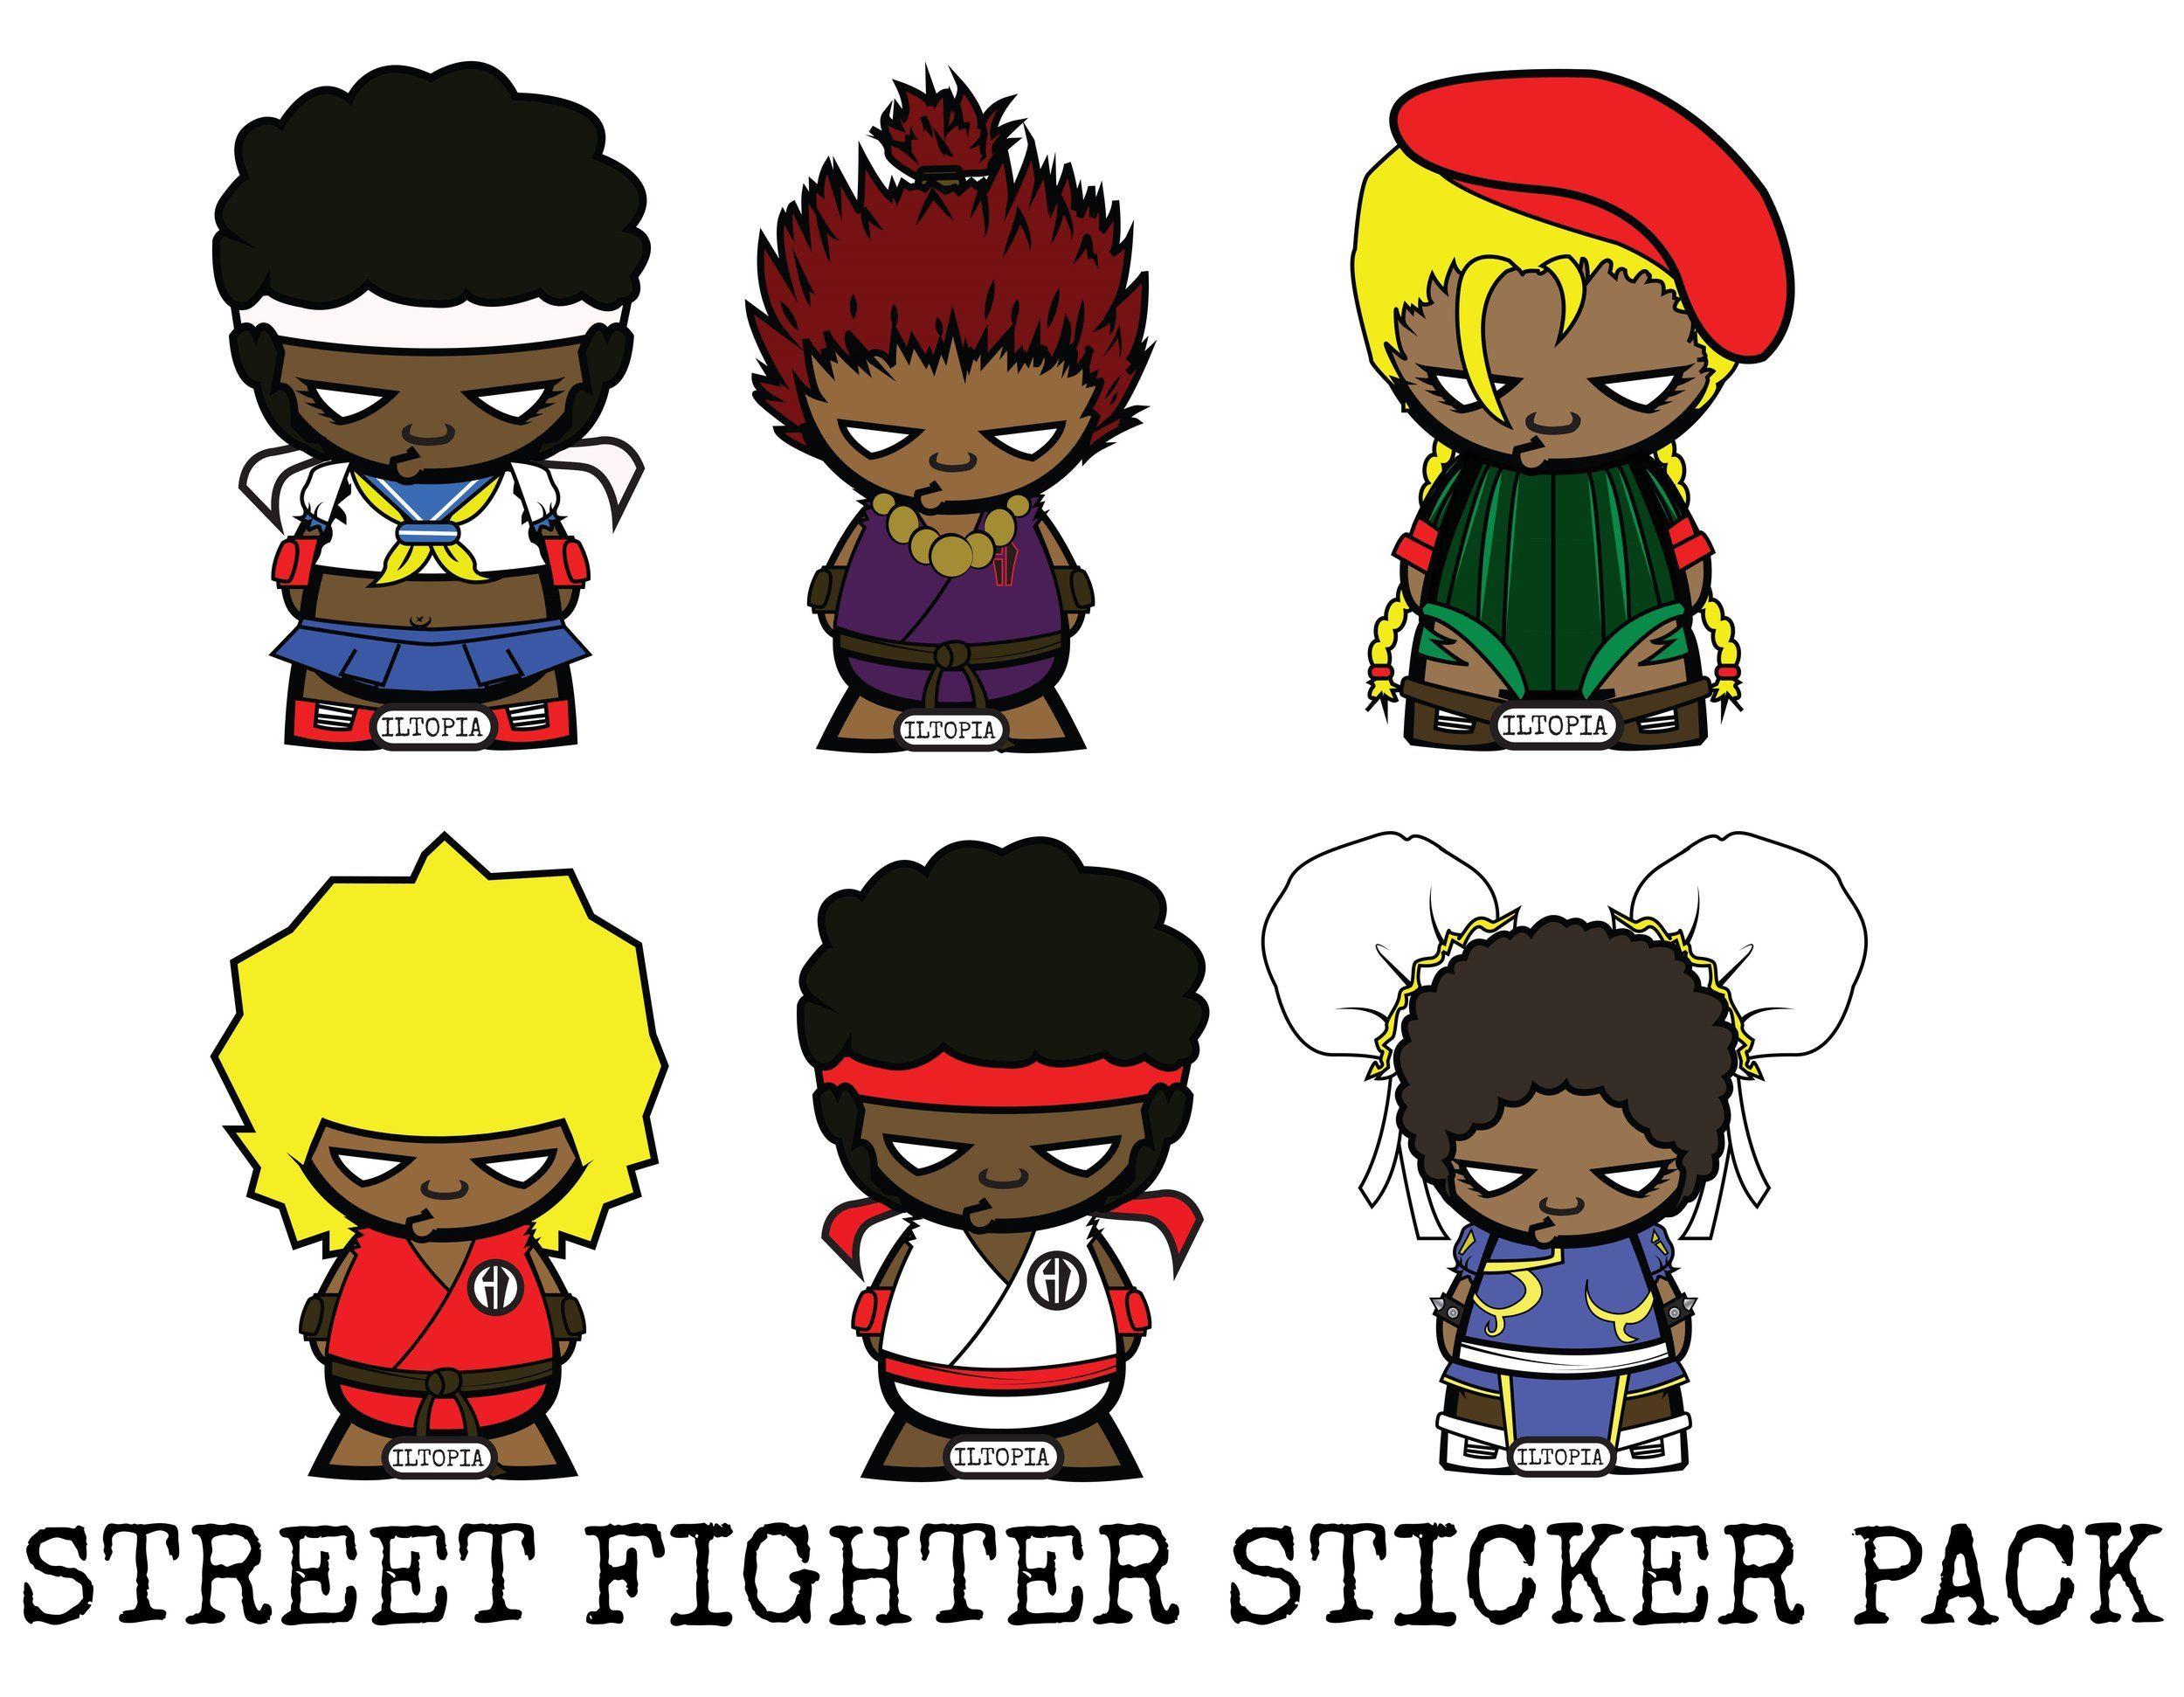 Street fighter sticker pack